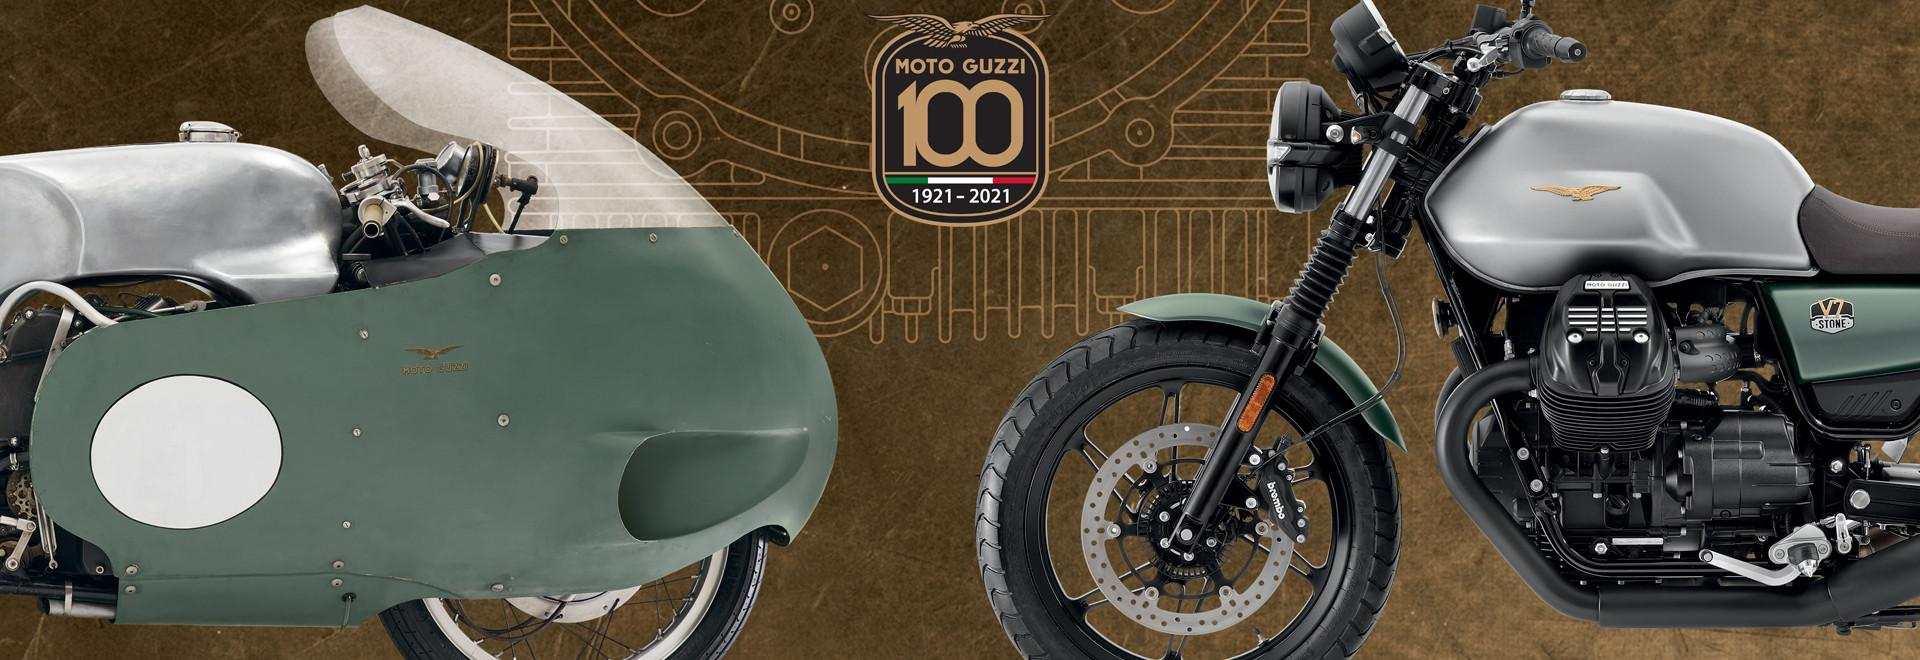 2020 MG 100 ans